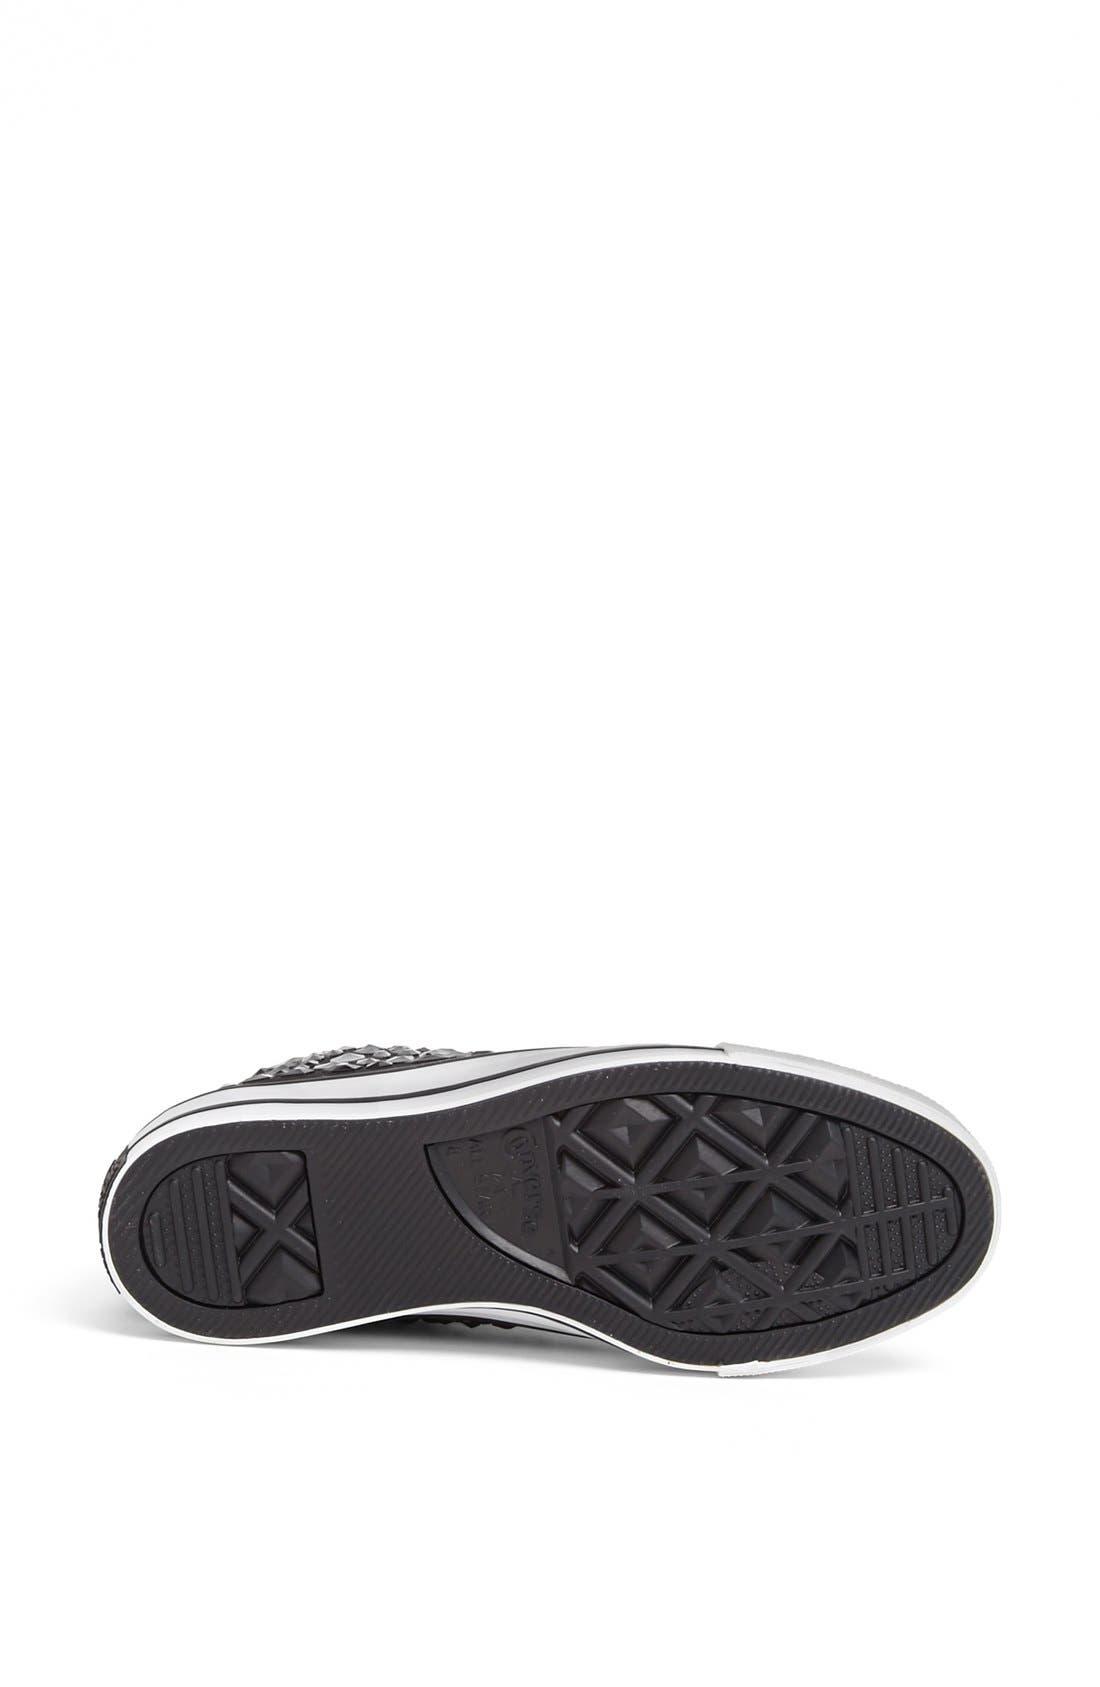 Alternate Image 4  - Converse Chuck Taylor® All Star® 'Rhinestone' High Top Sneaker (Women)